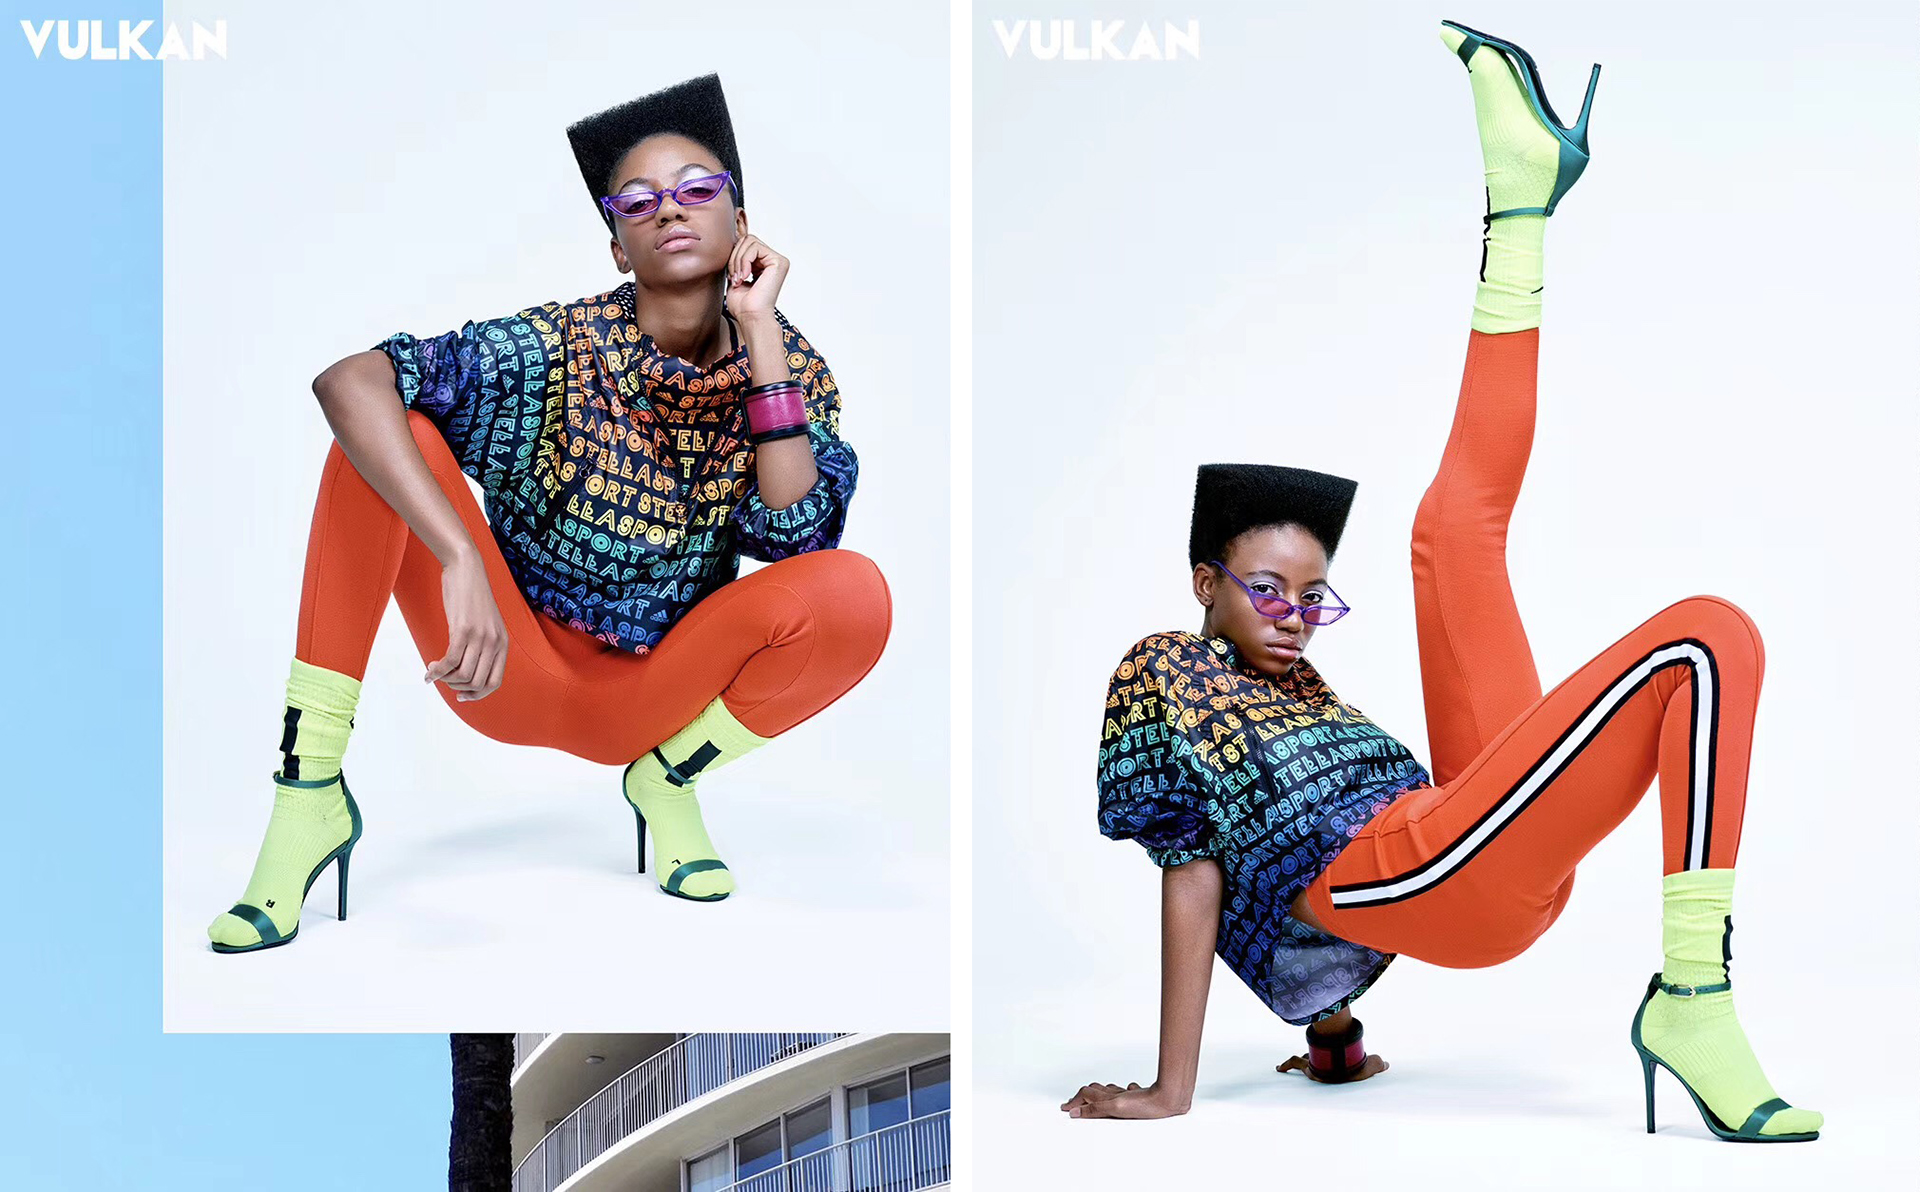 Christina Rateau poses for Vulkan